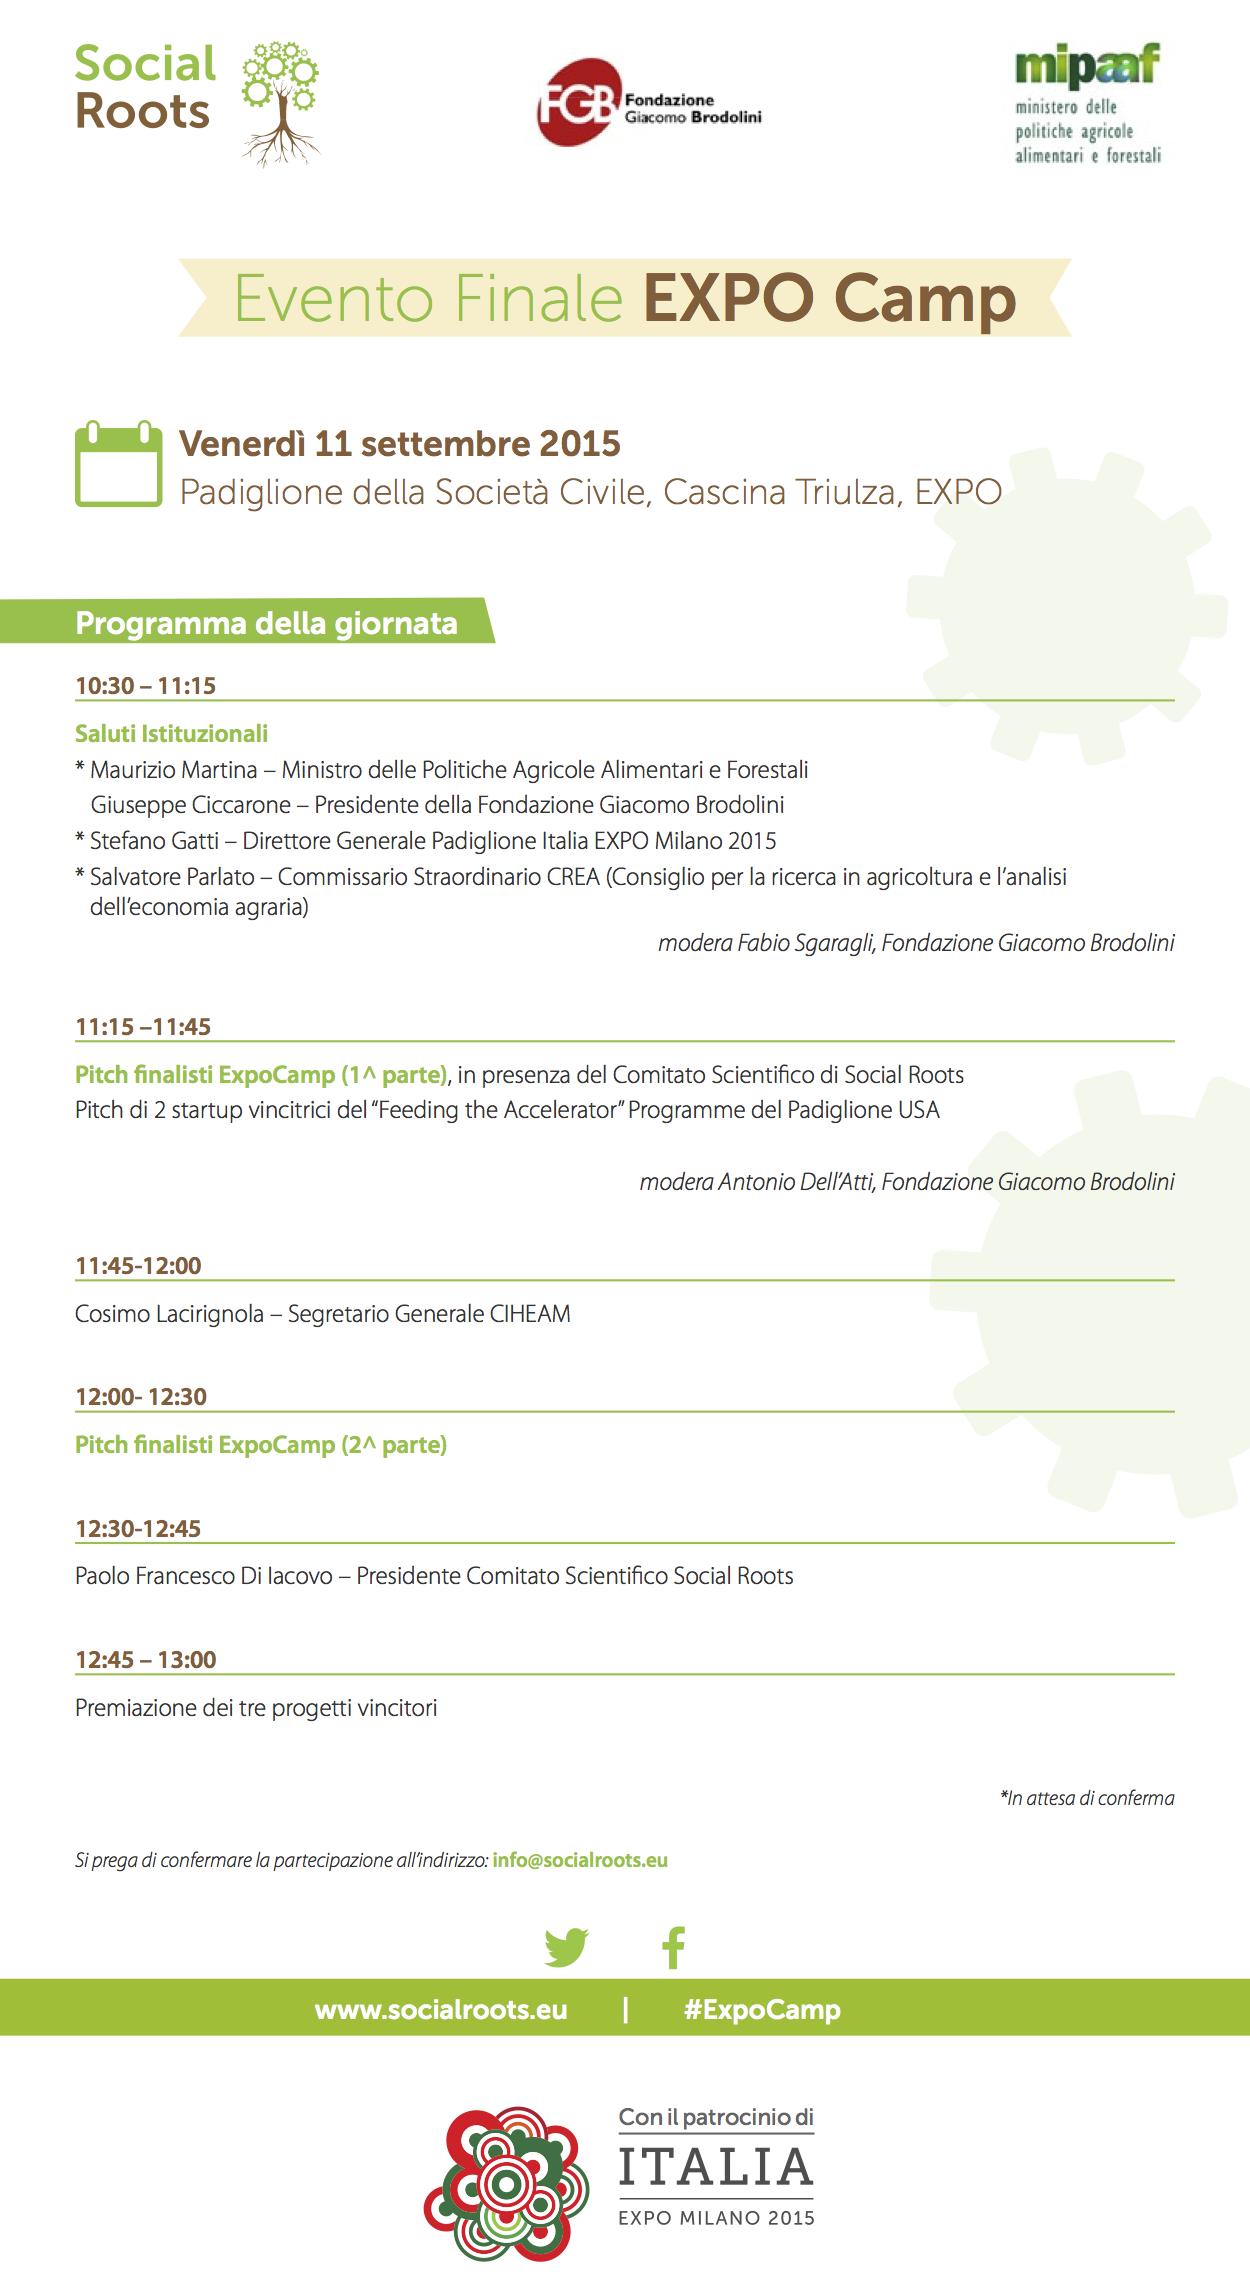 EXPO Camp Final Event: programma